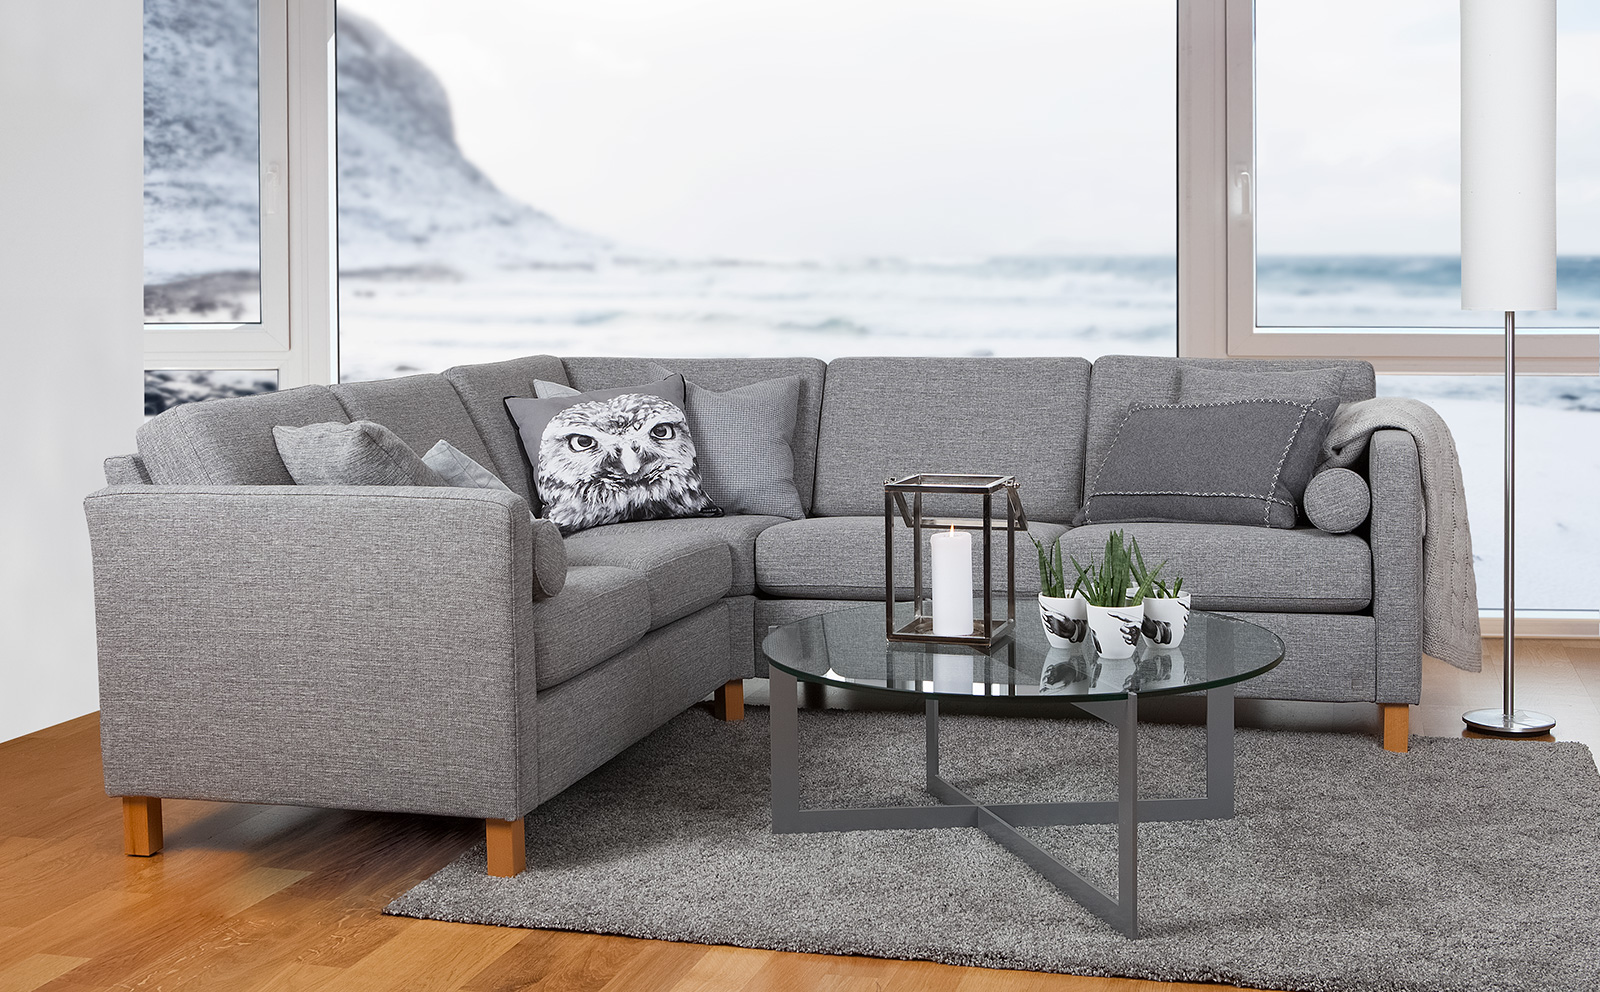 Sandefjord_sofa-nytt-bordA.jpg